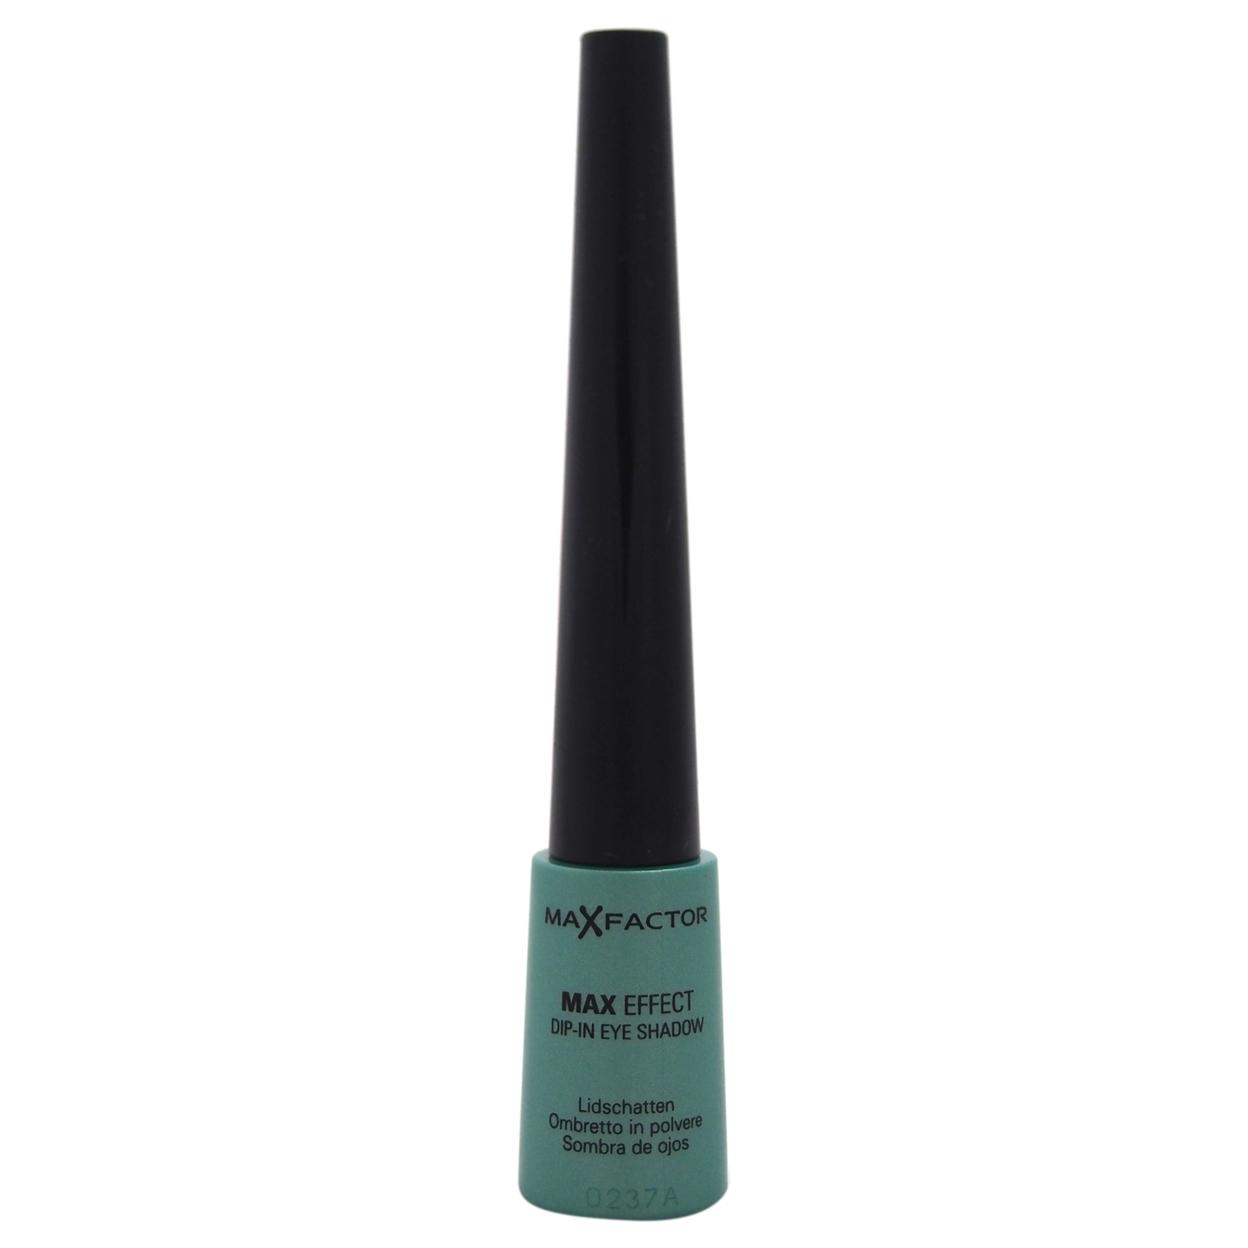 Max Effect Dip-In Eye Shadow - # 07 Vibrant Turquoise by Max Factor for Women - 1 g Eye Shadow 55bf9dbda2771c1c548b4c23